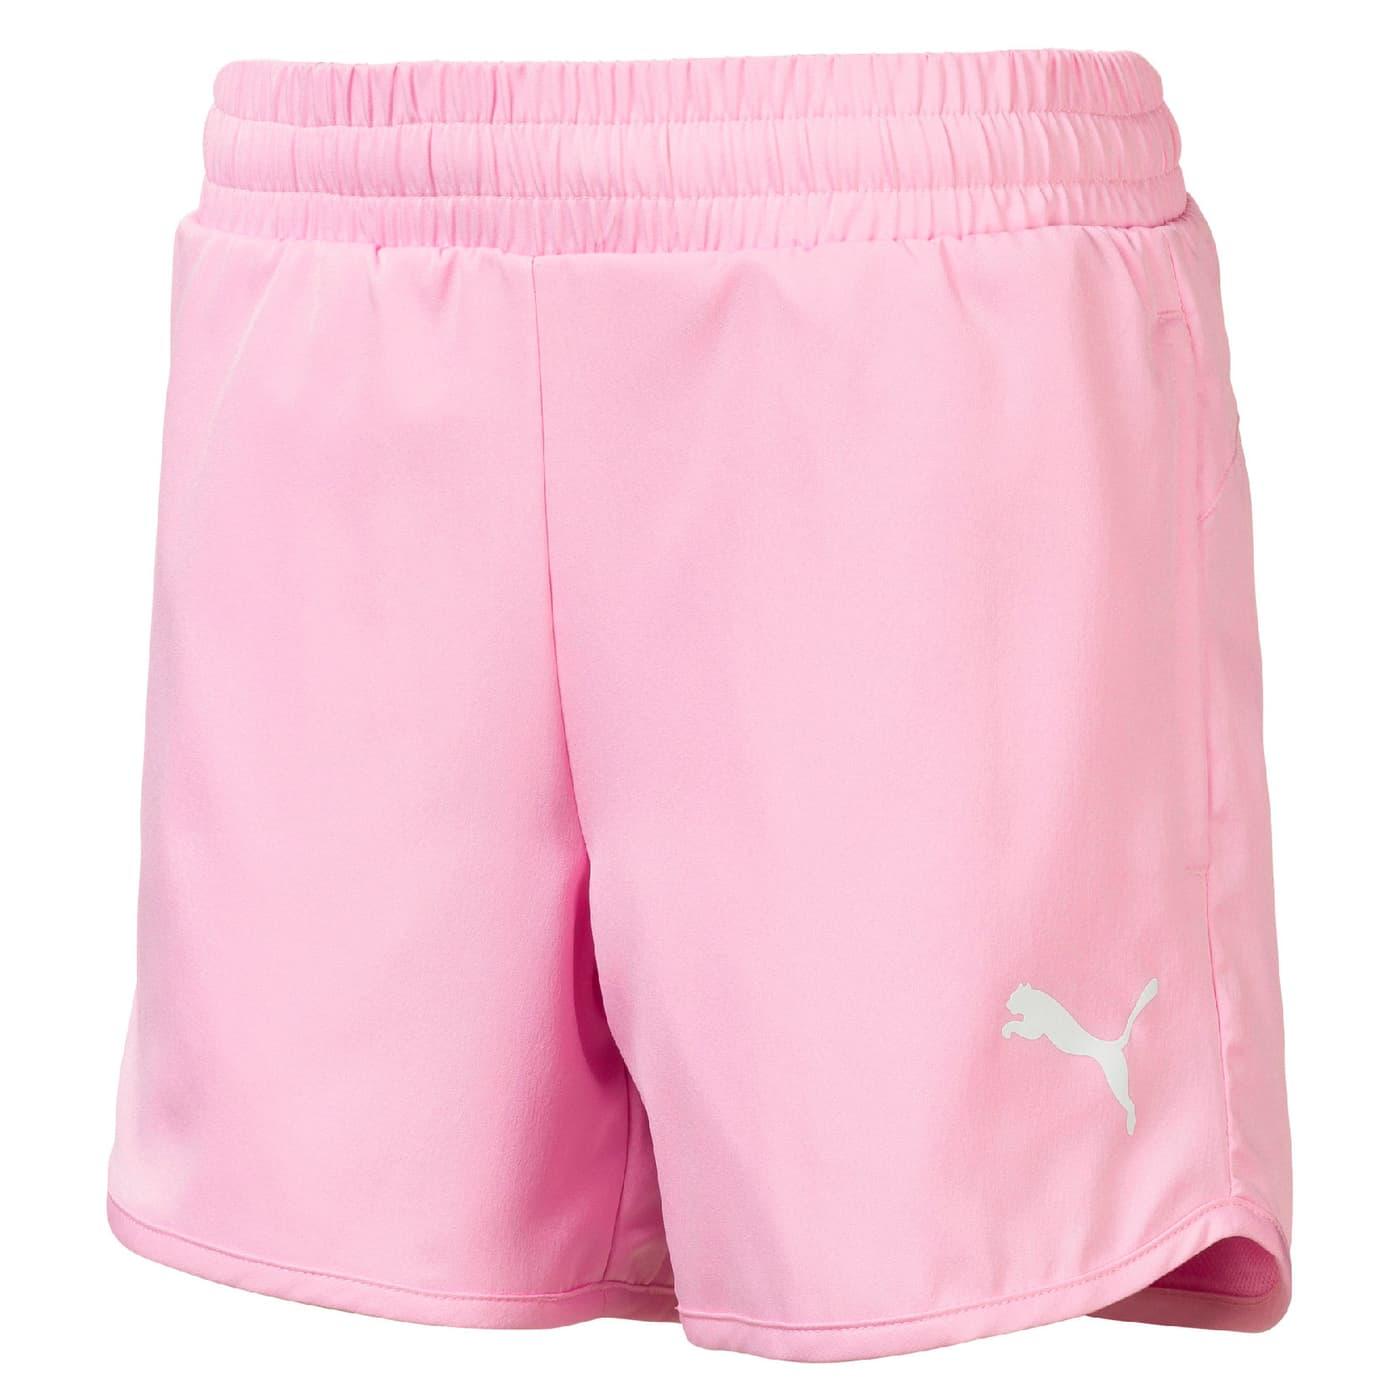 new product d962e 51de9 Puma Active Shorts G Pantaloncini da bambina